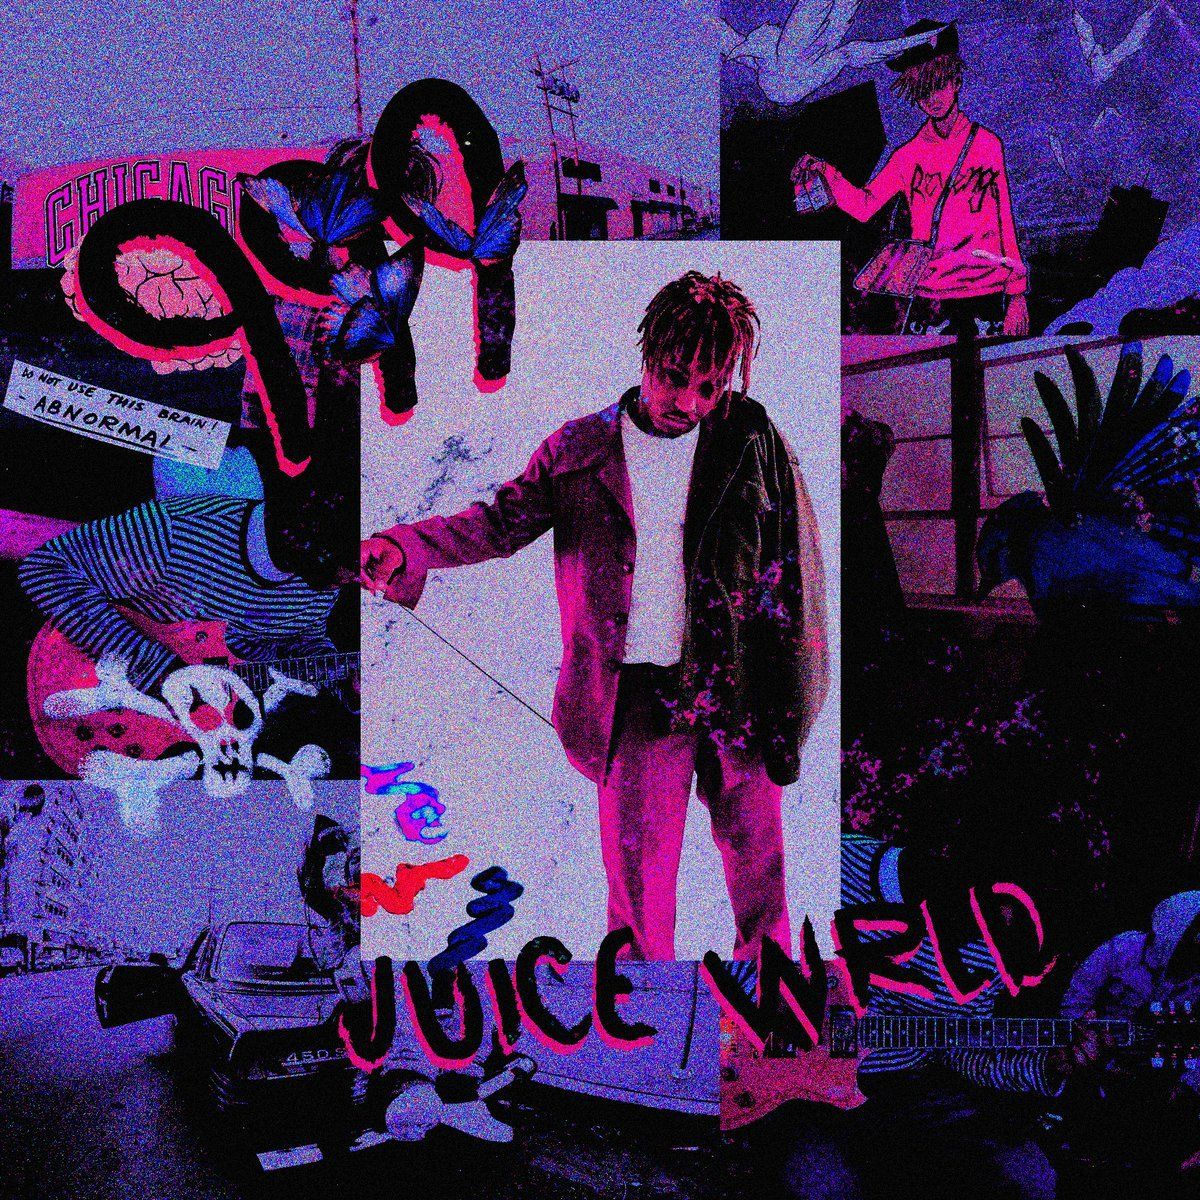 Juice Wrld 999 Wallpapers Top Free Juice Wrld 999 Backgrounds